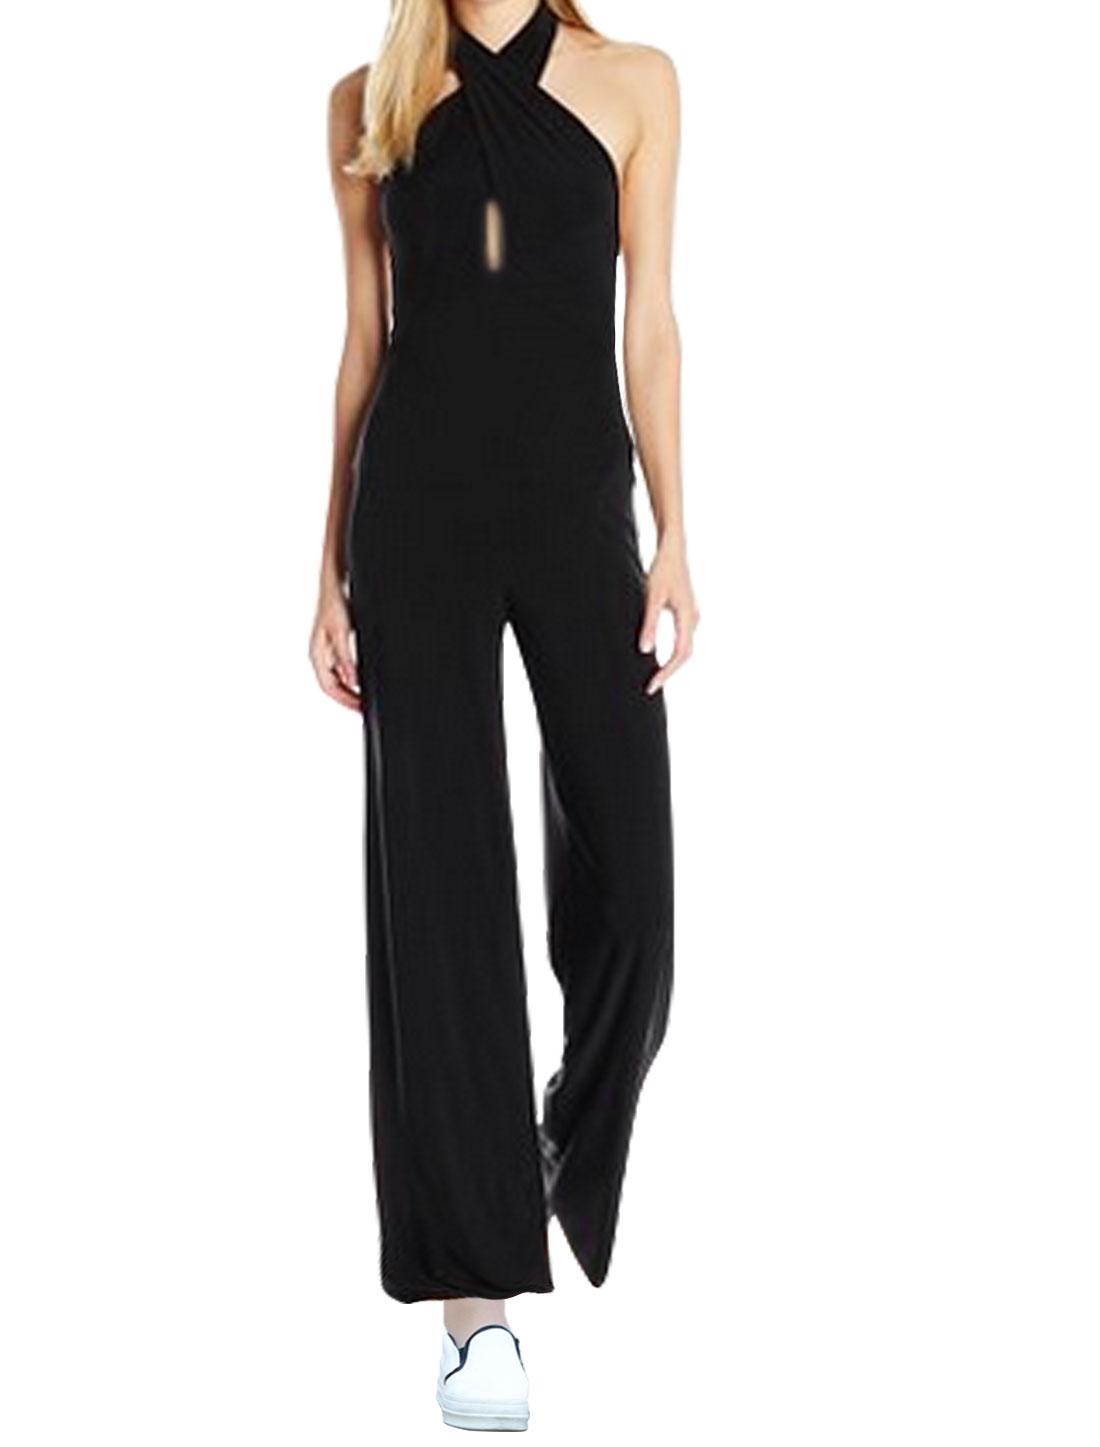 Women Halter Neckline Open Back Wide Leg Jumpsuit Black XL